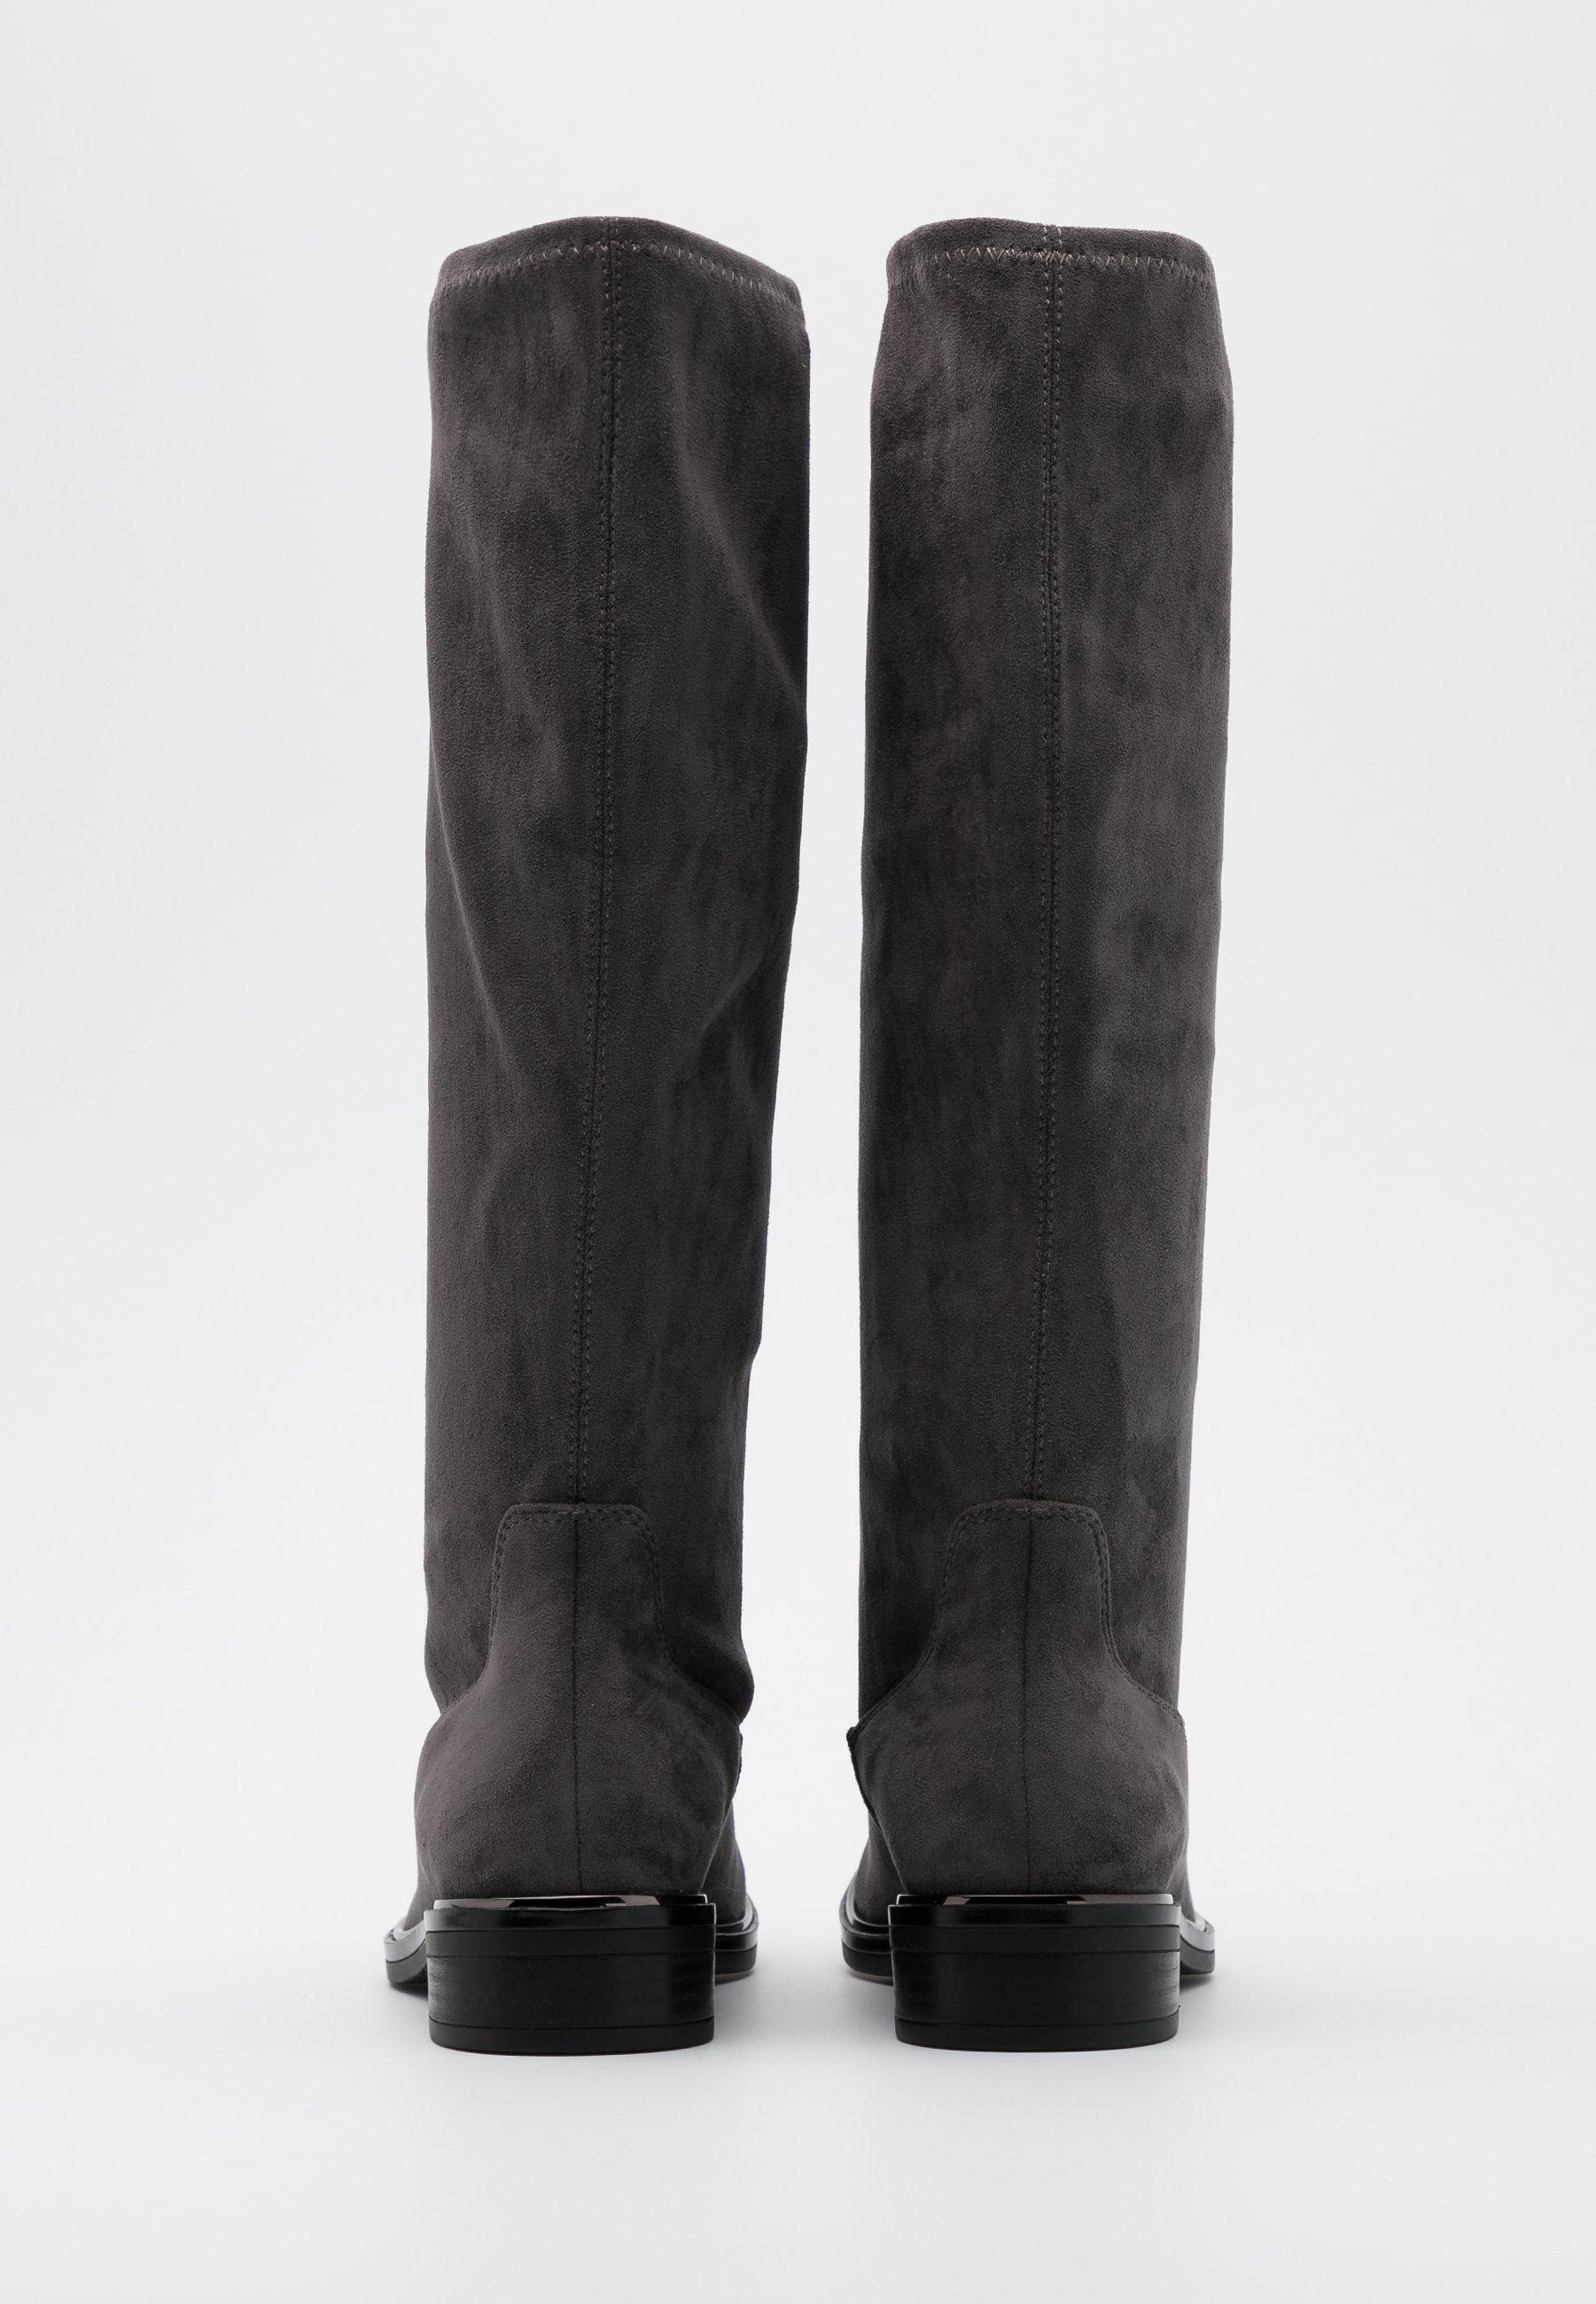 Caprice Boots - Stiefel Dark Grey/dunkelgrau